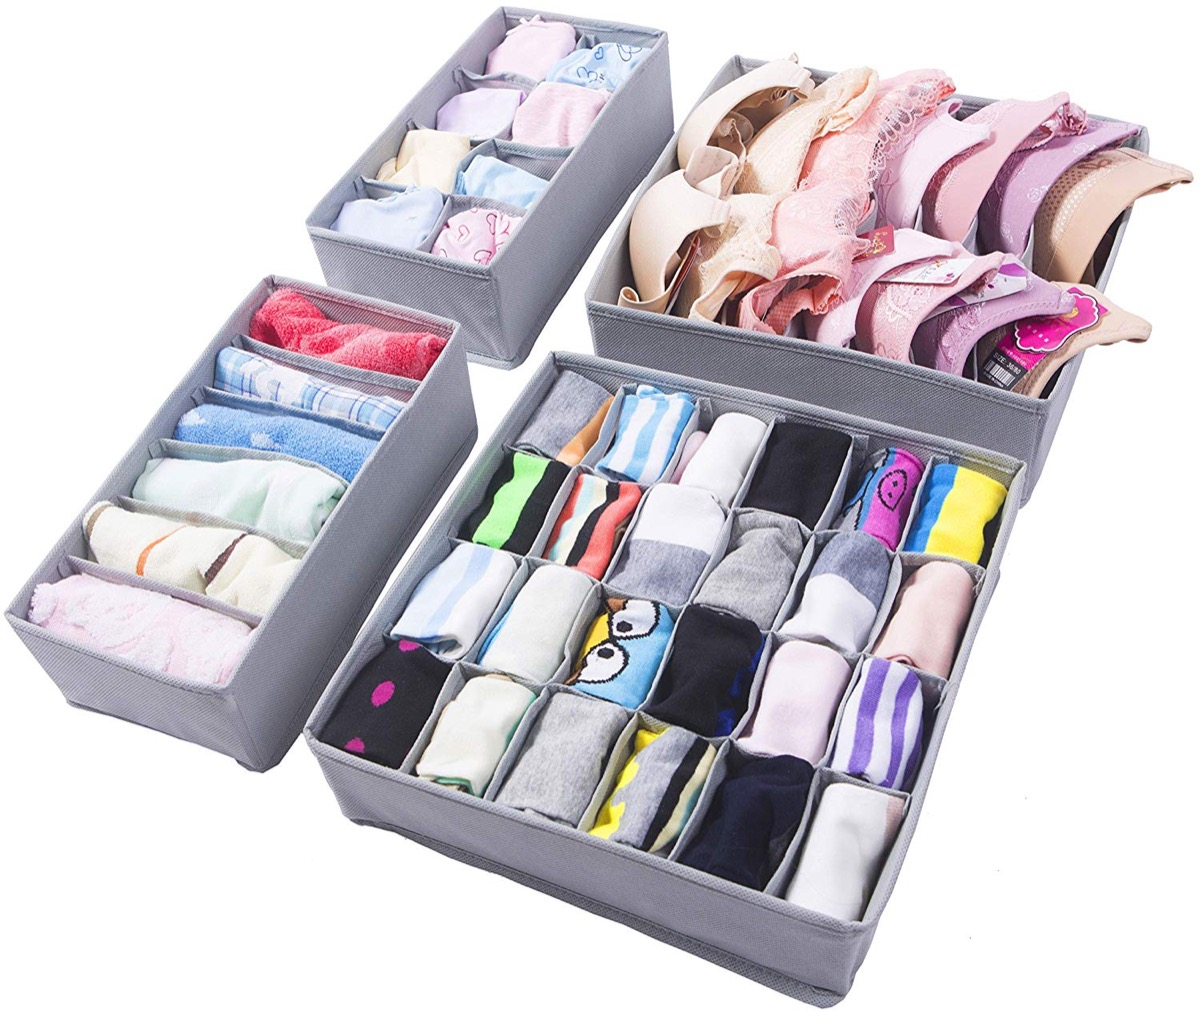 Undergarment Drawer Organizers {Organizational Products on Amazon}